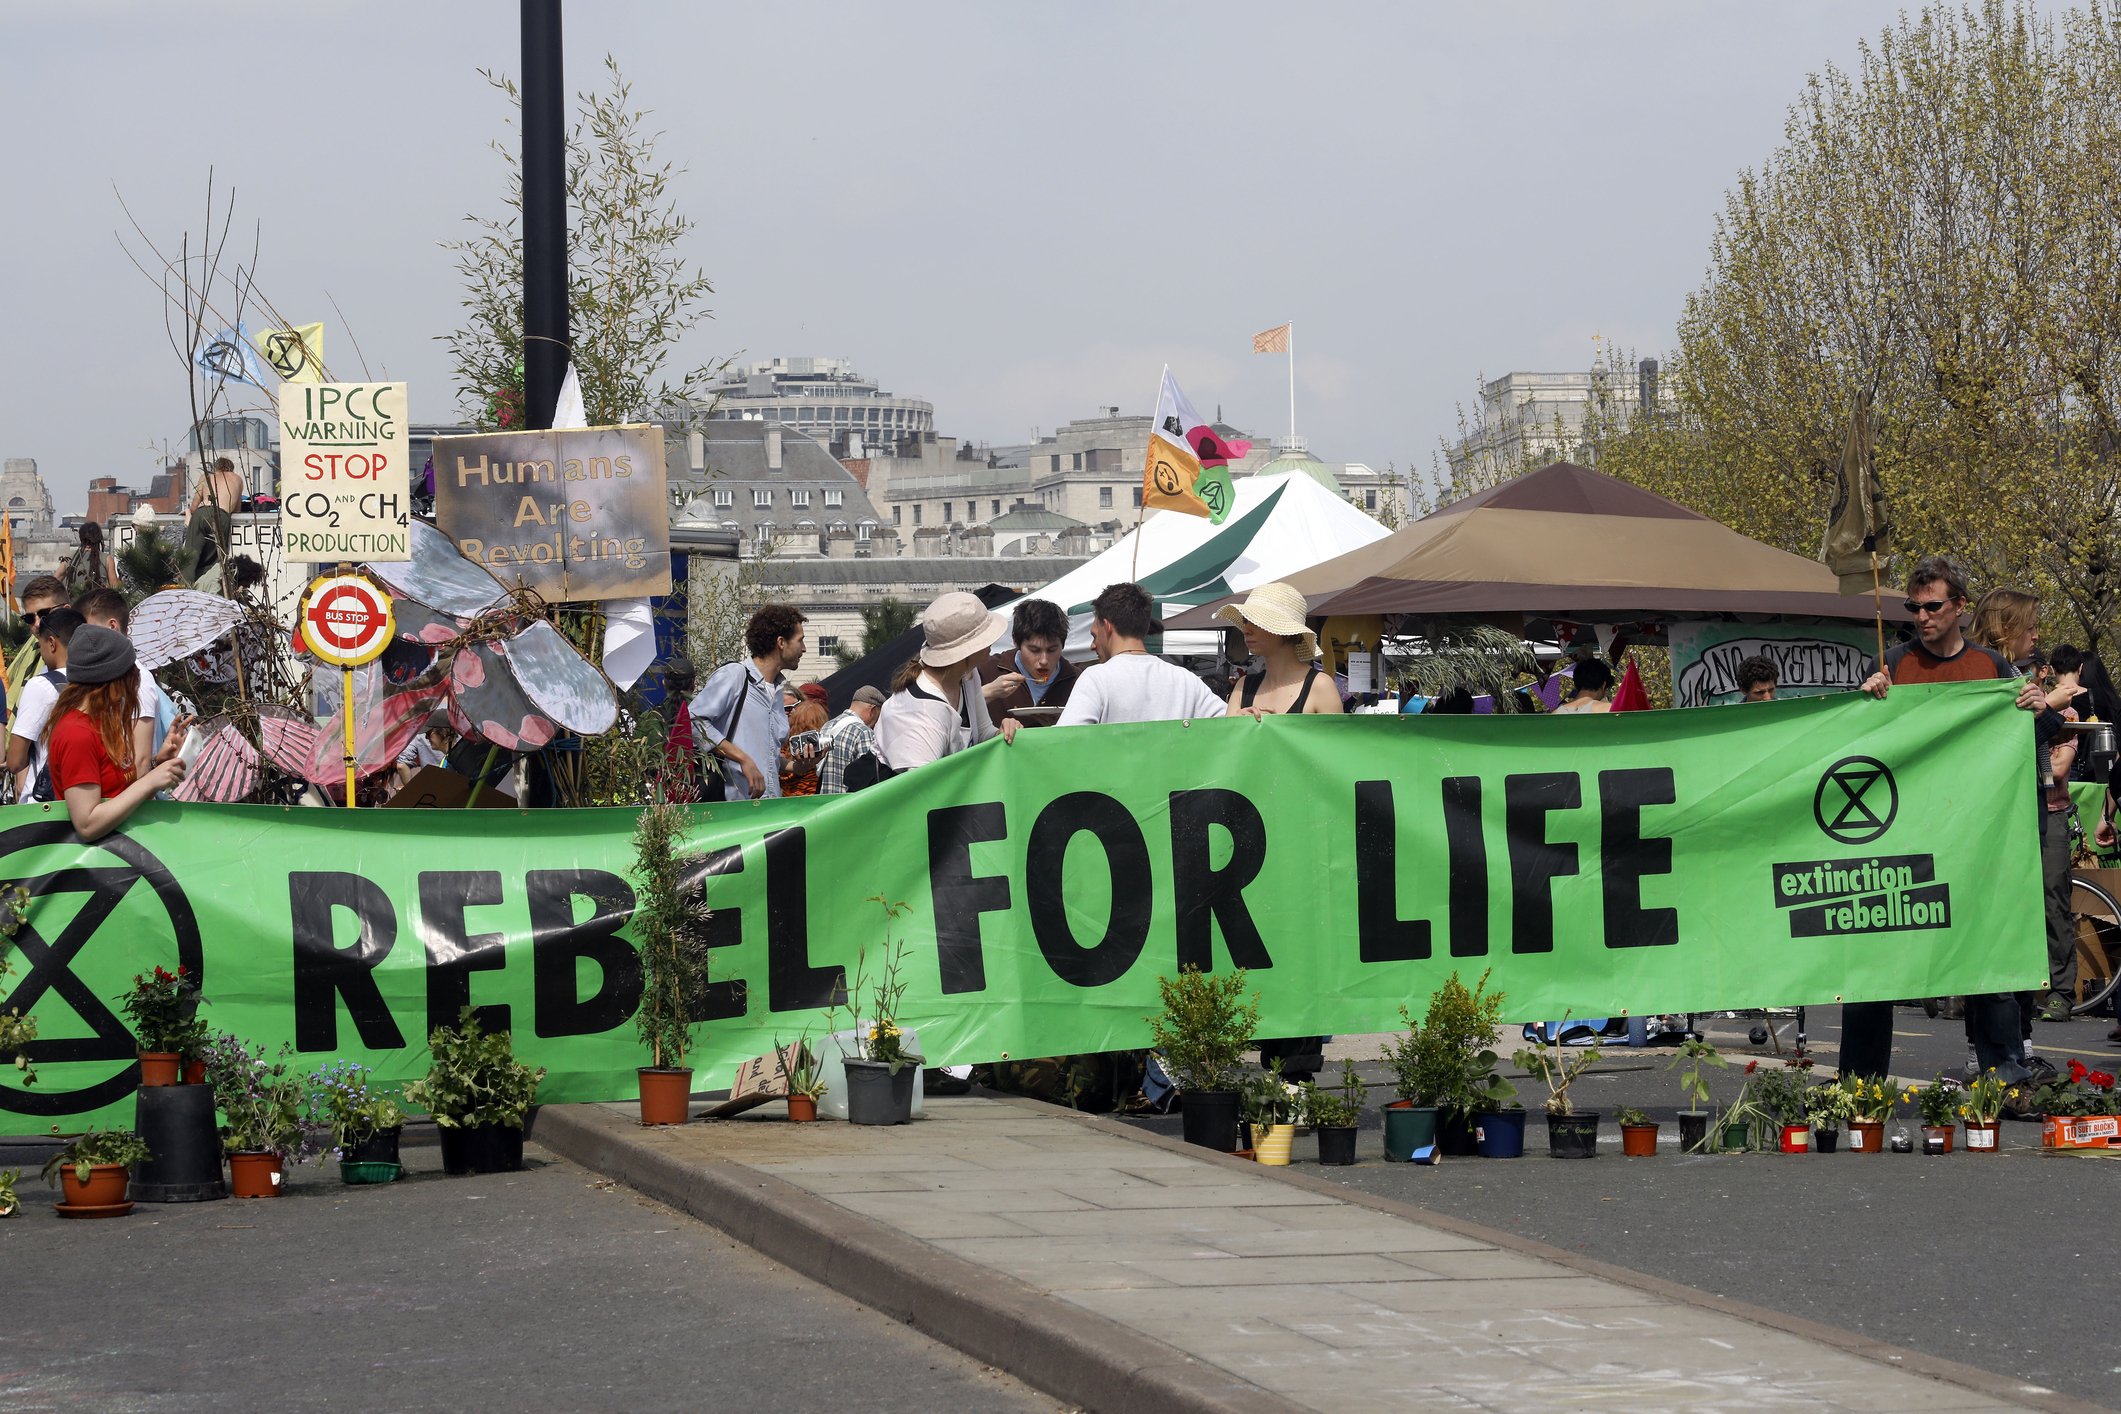 Rebel_for_life_image